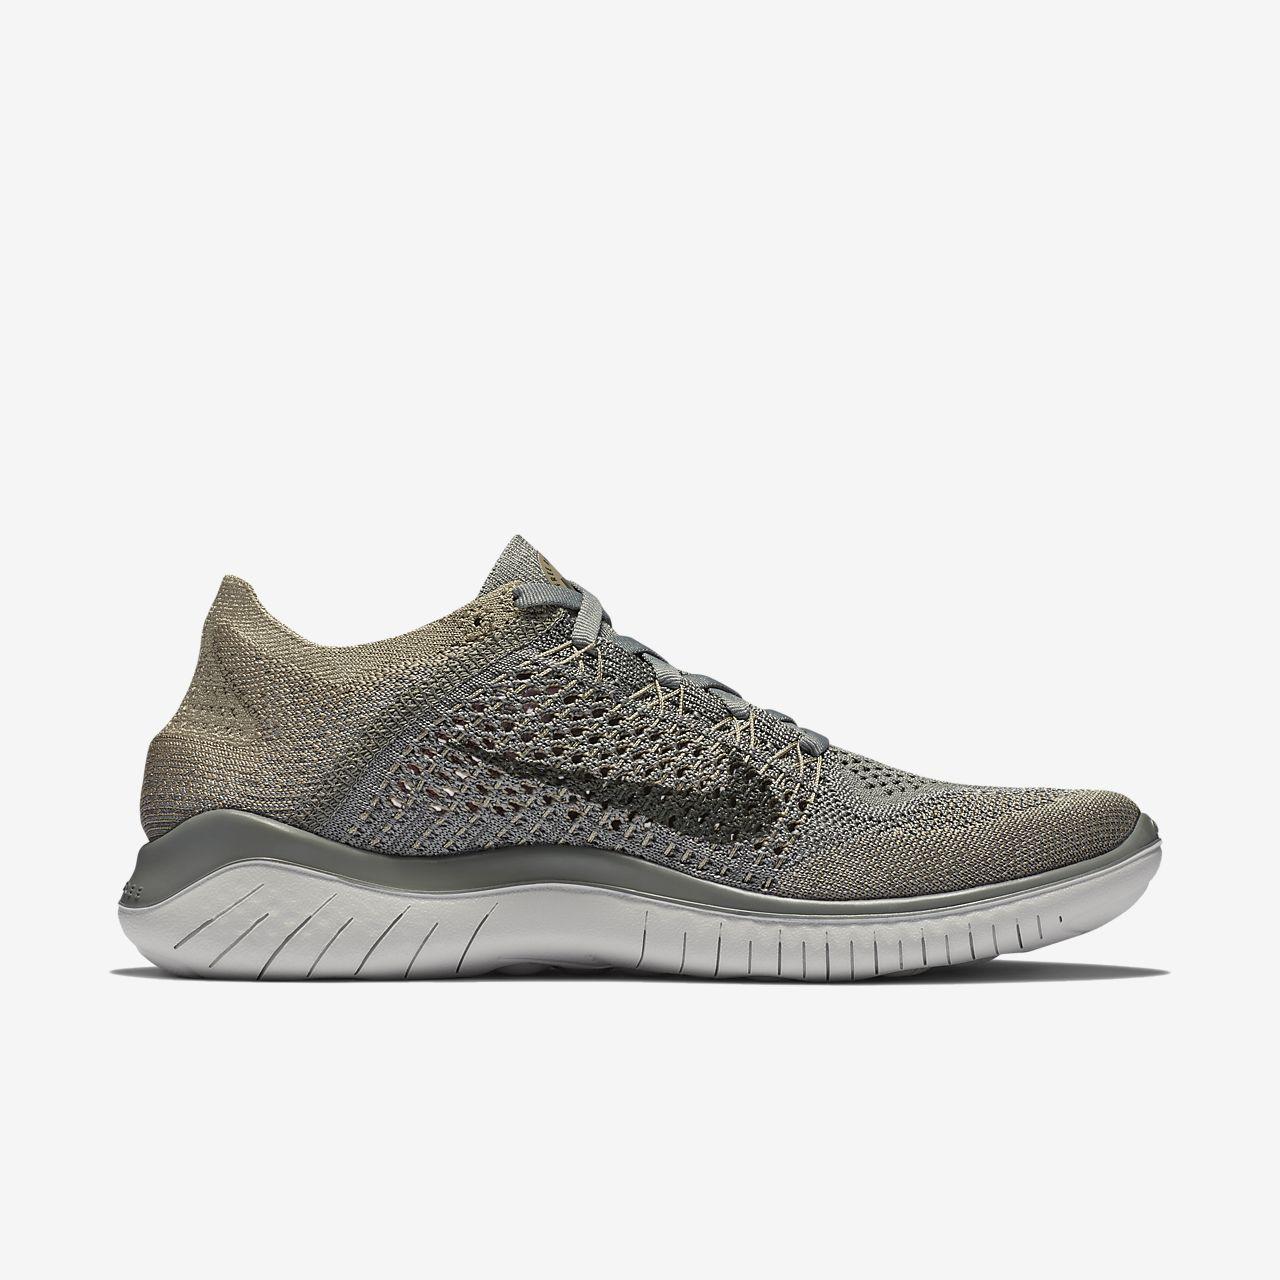 NIKE Womens Nike Free Rn Running Flyknit 2018 942839-003 DARK STUCCO Size 6.5